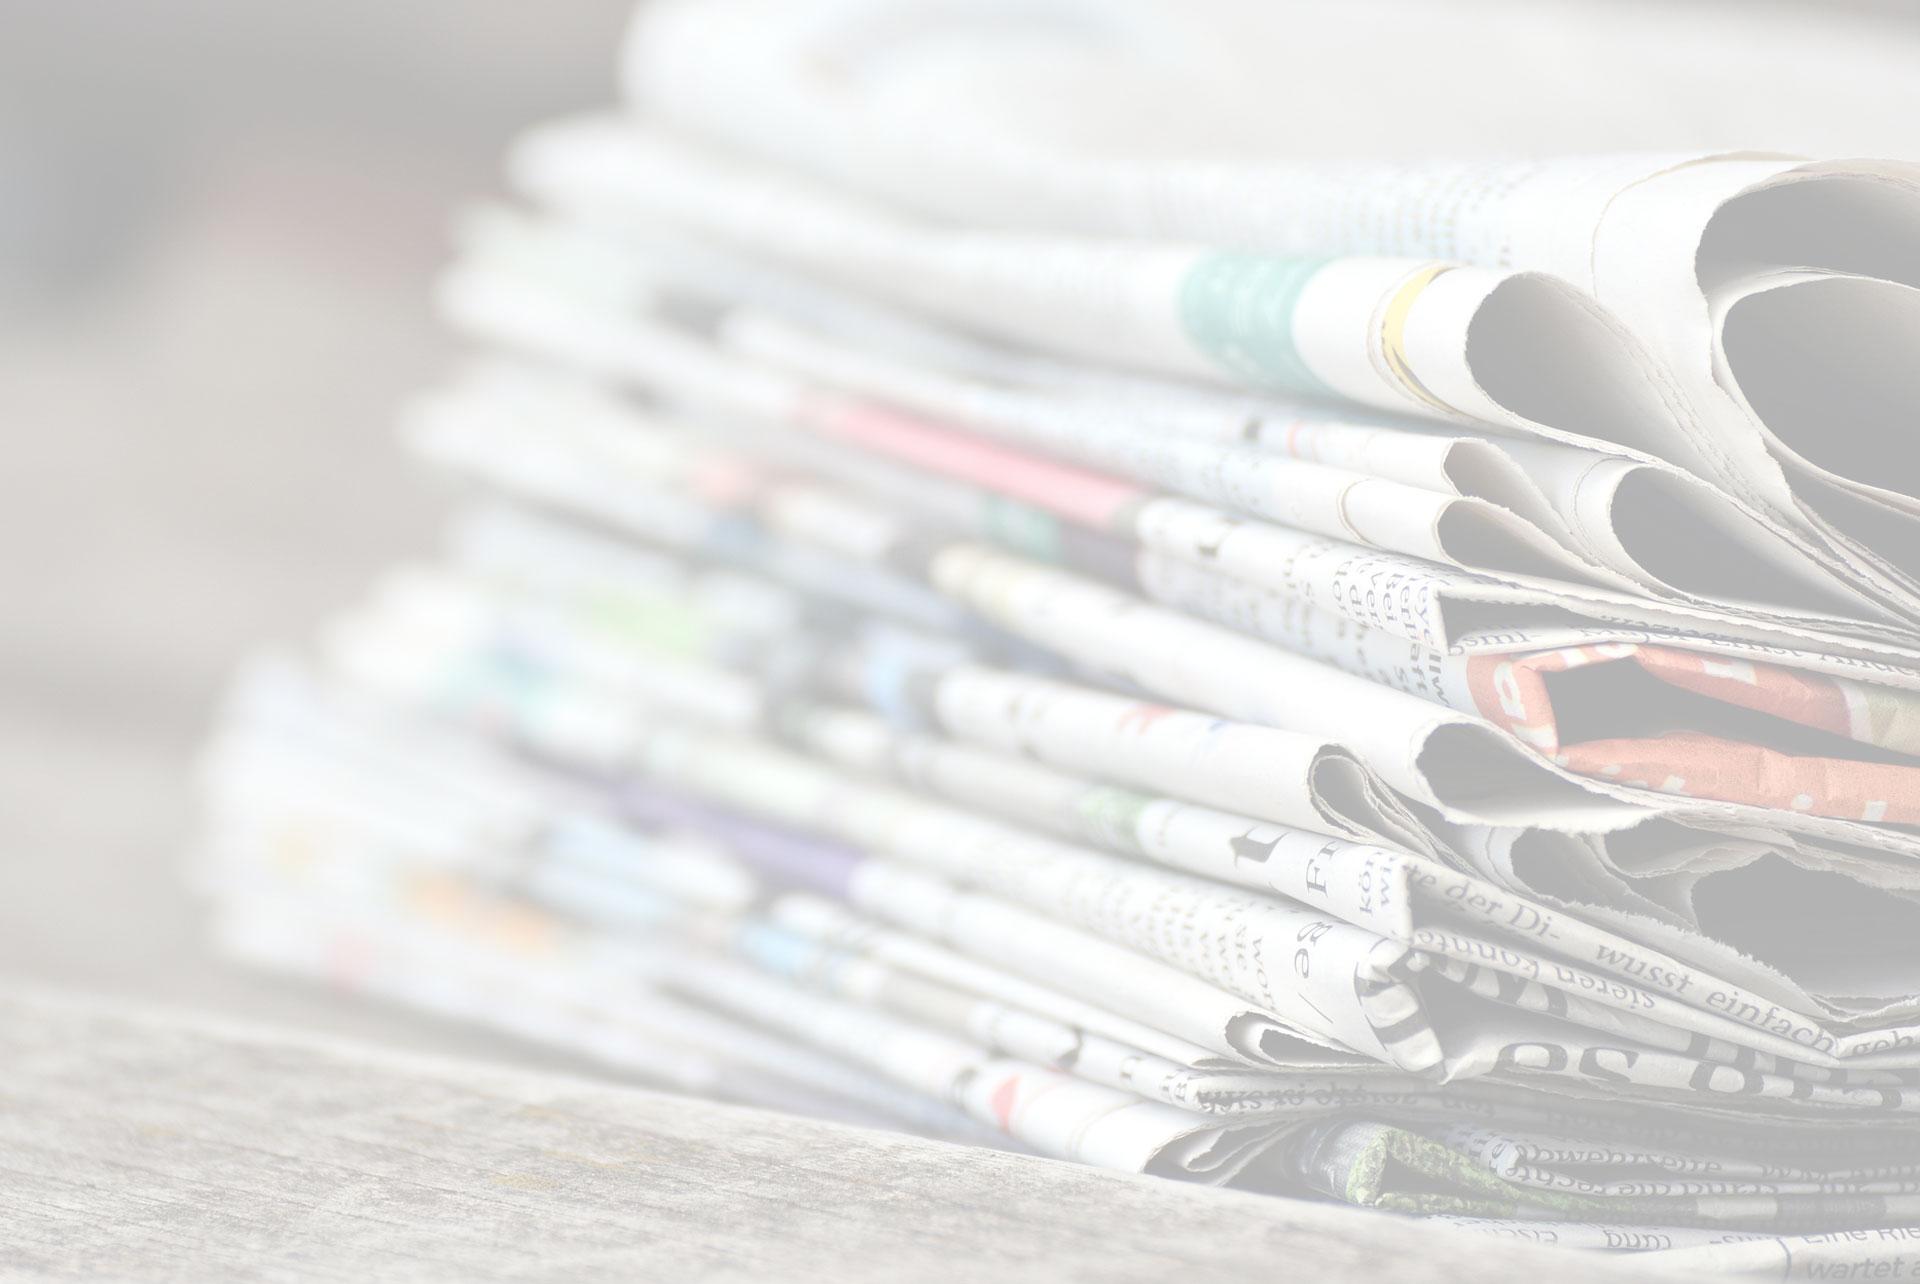 Angela Merkel visita Auschwitz: è la sua prima volta